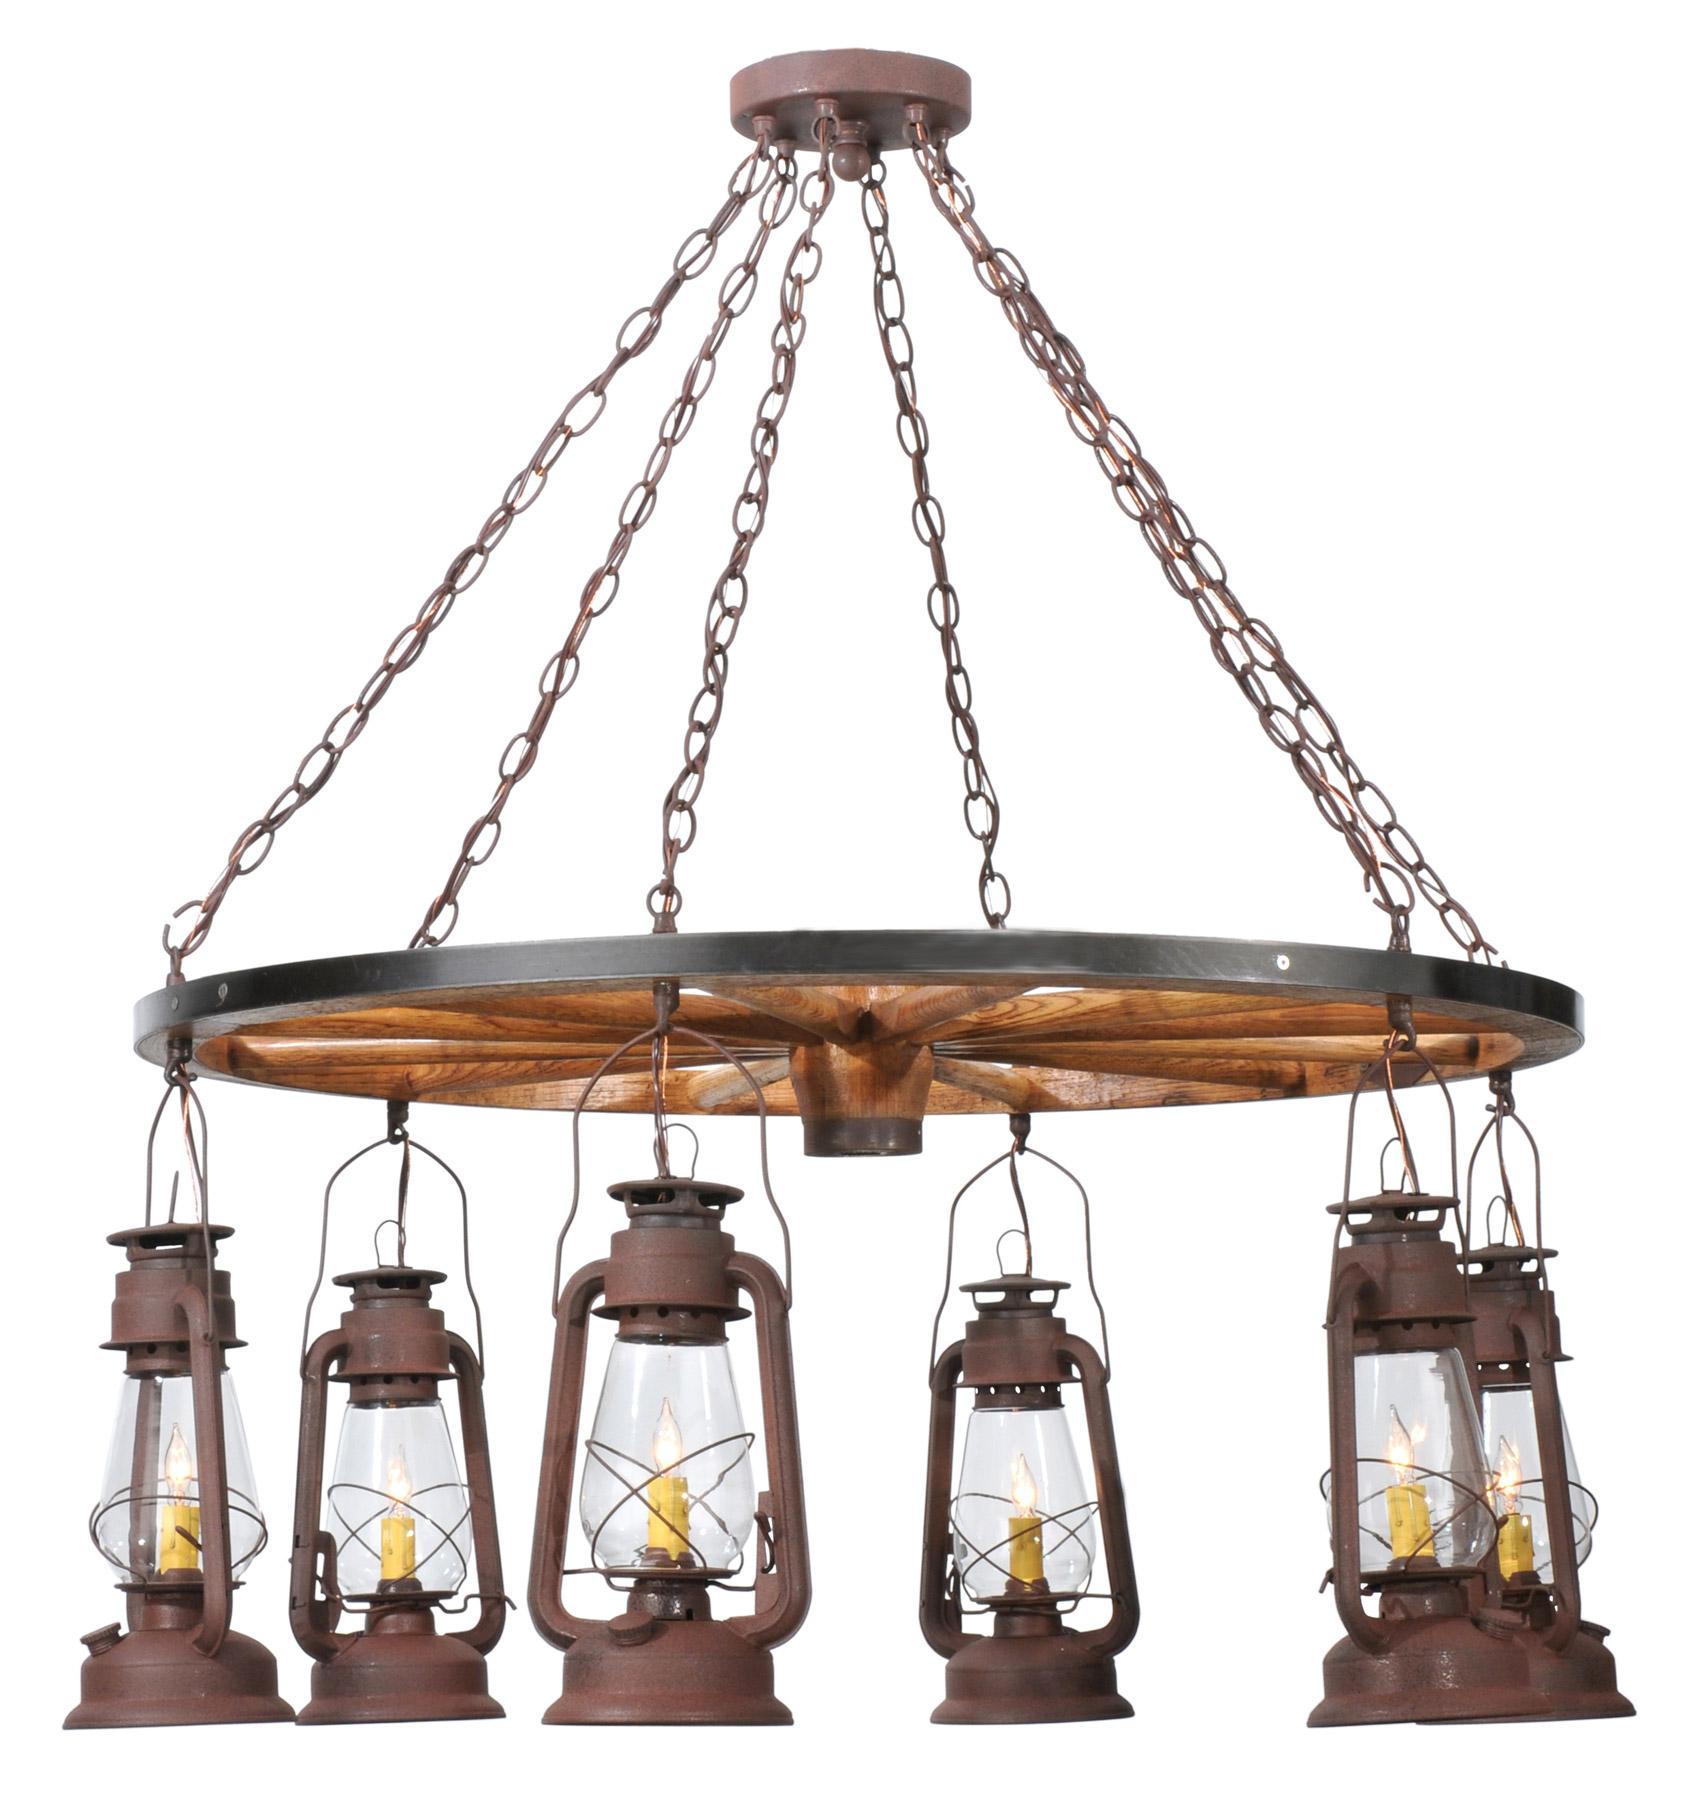 kitchen aid cabinets design layout ideas outdoor chandelier lighting fixtures - decor ideasdecor